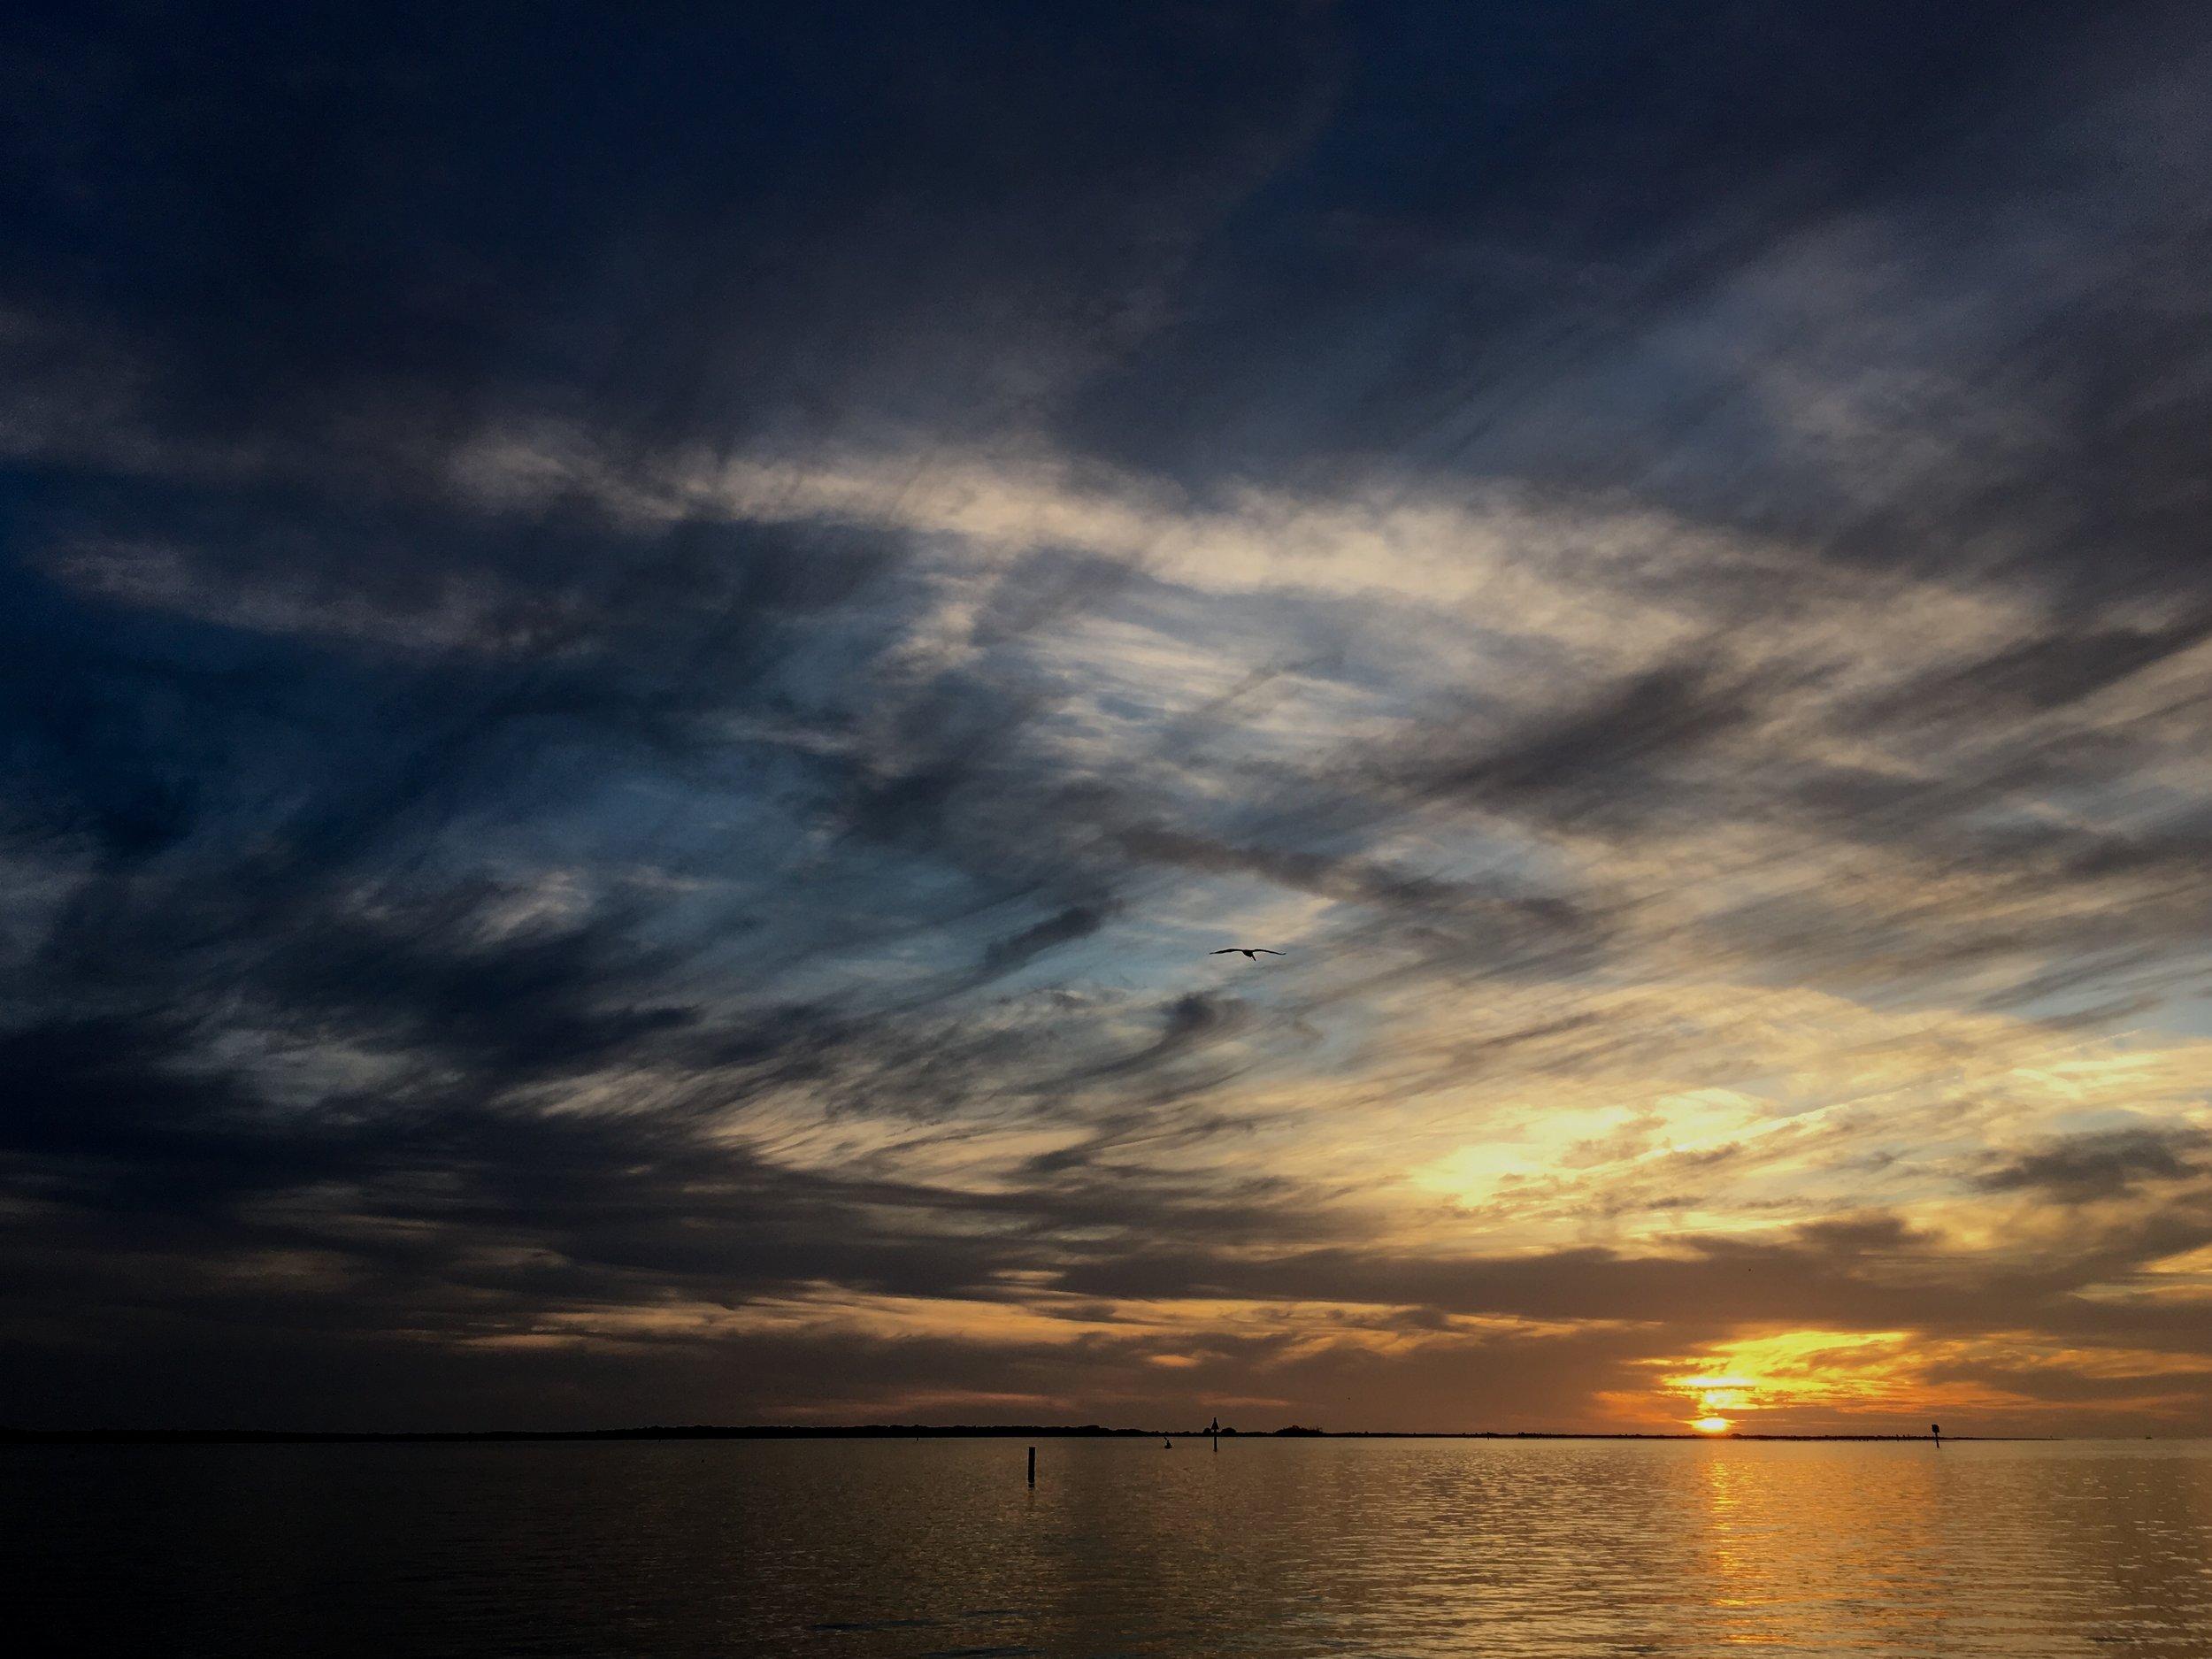 December Sundown poem; lifeisaprettyword.com; saying goodbye to the year